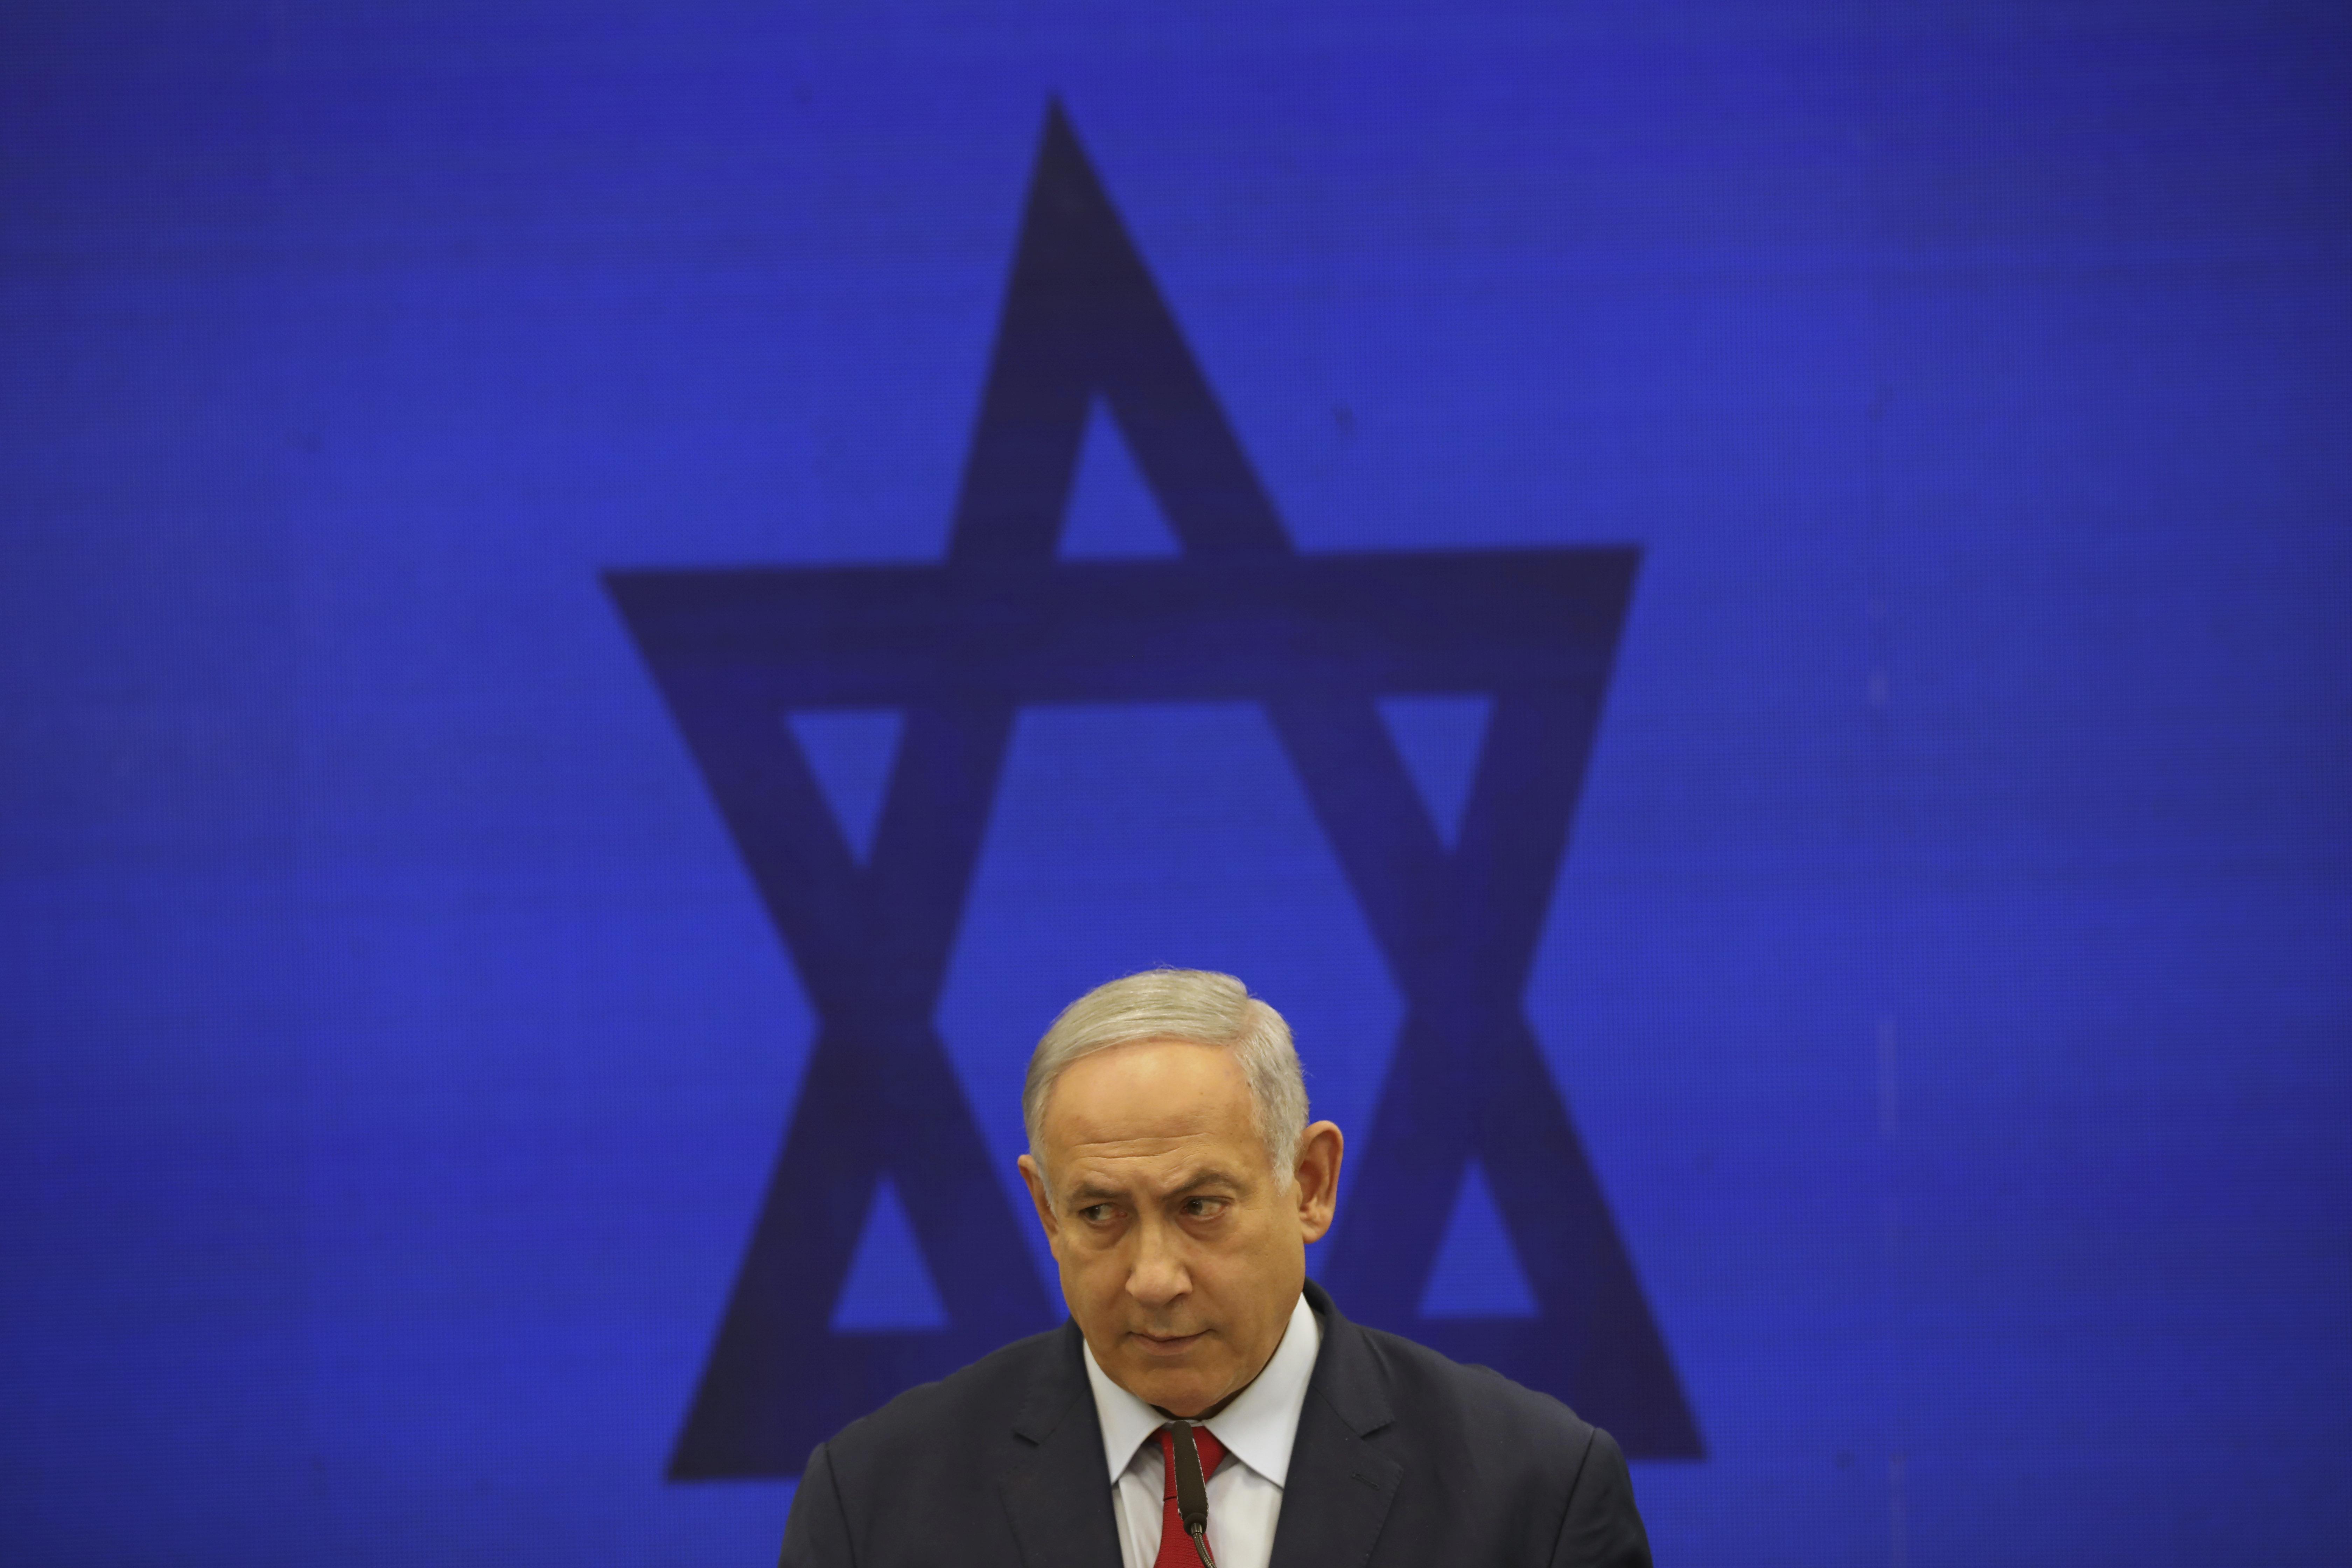 Israeli Prime Minister Benjamin Netanyahu at a press conference in Tel Aviv, Israel